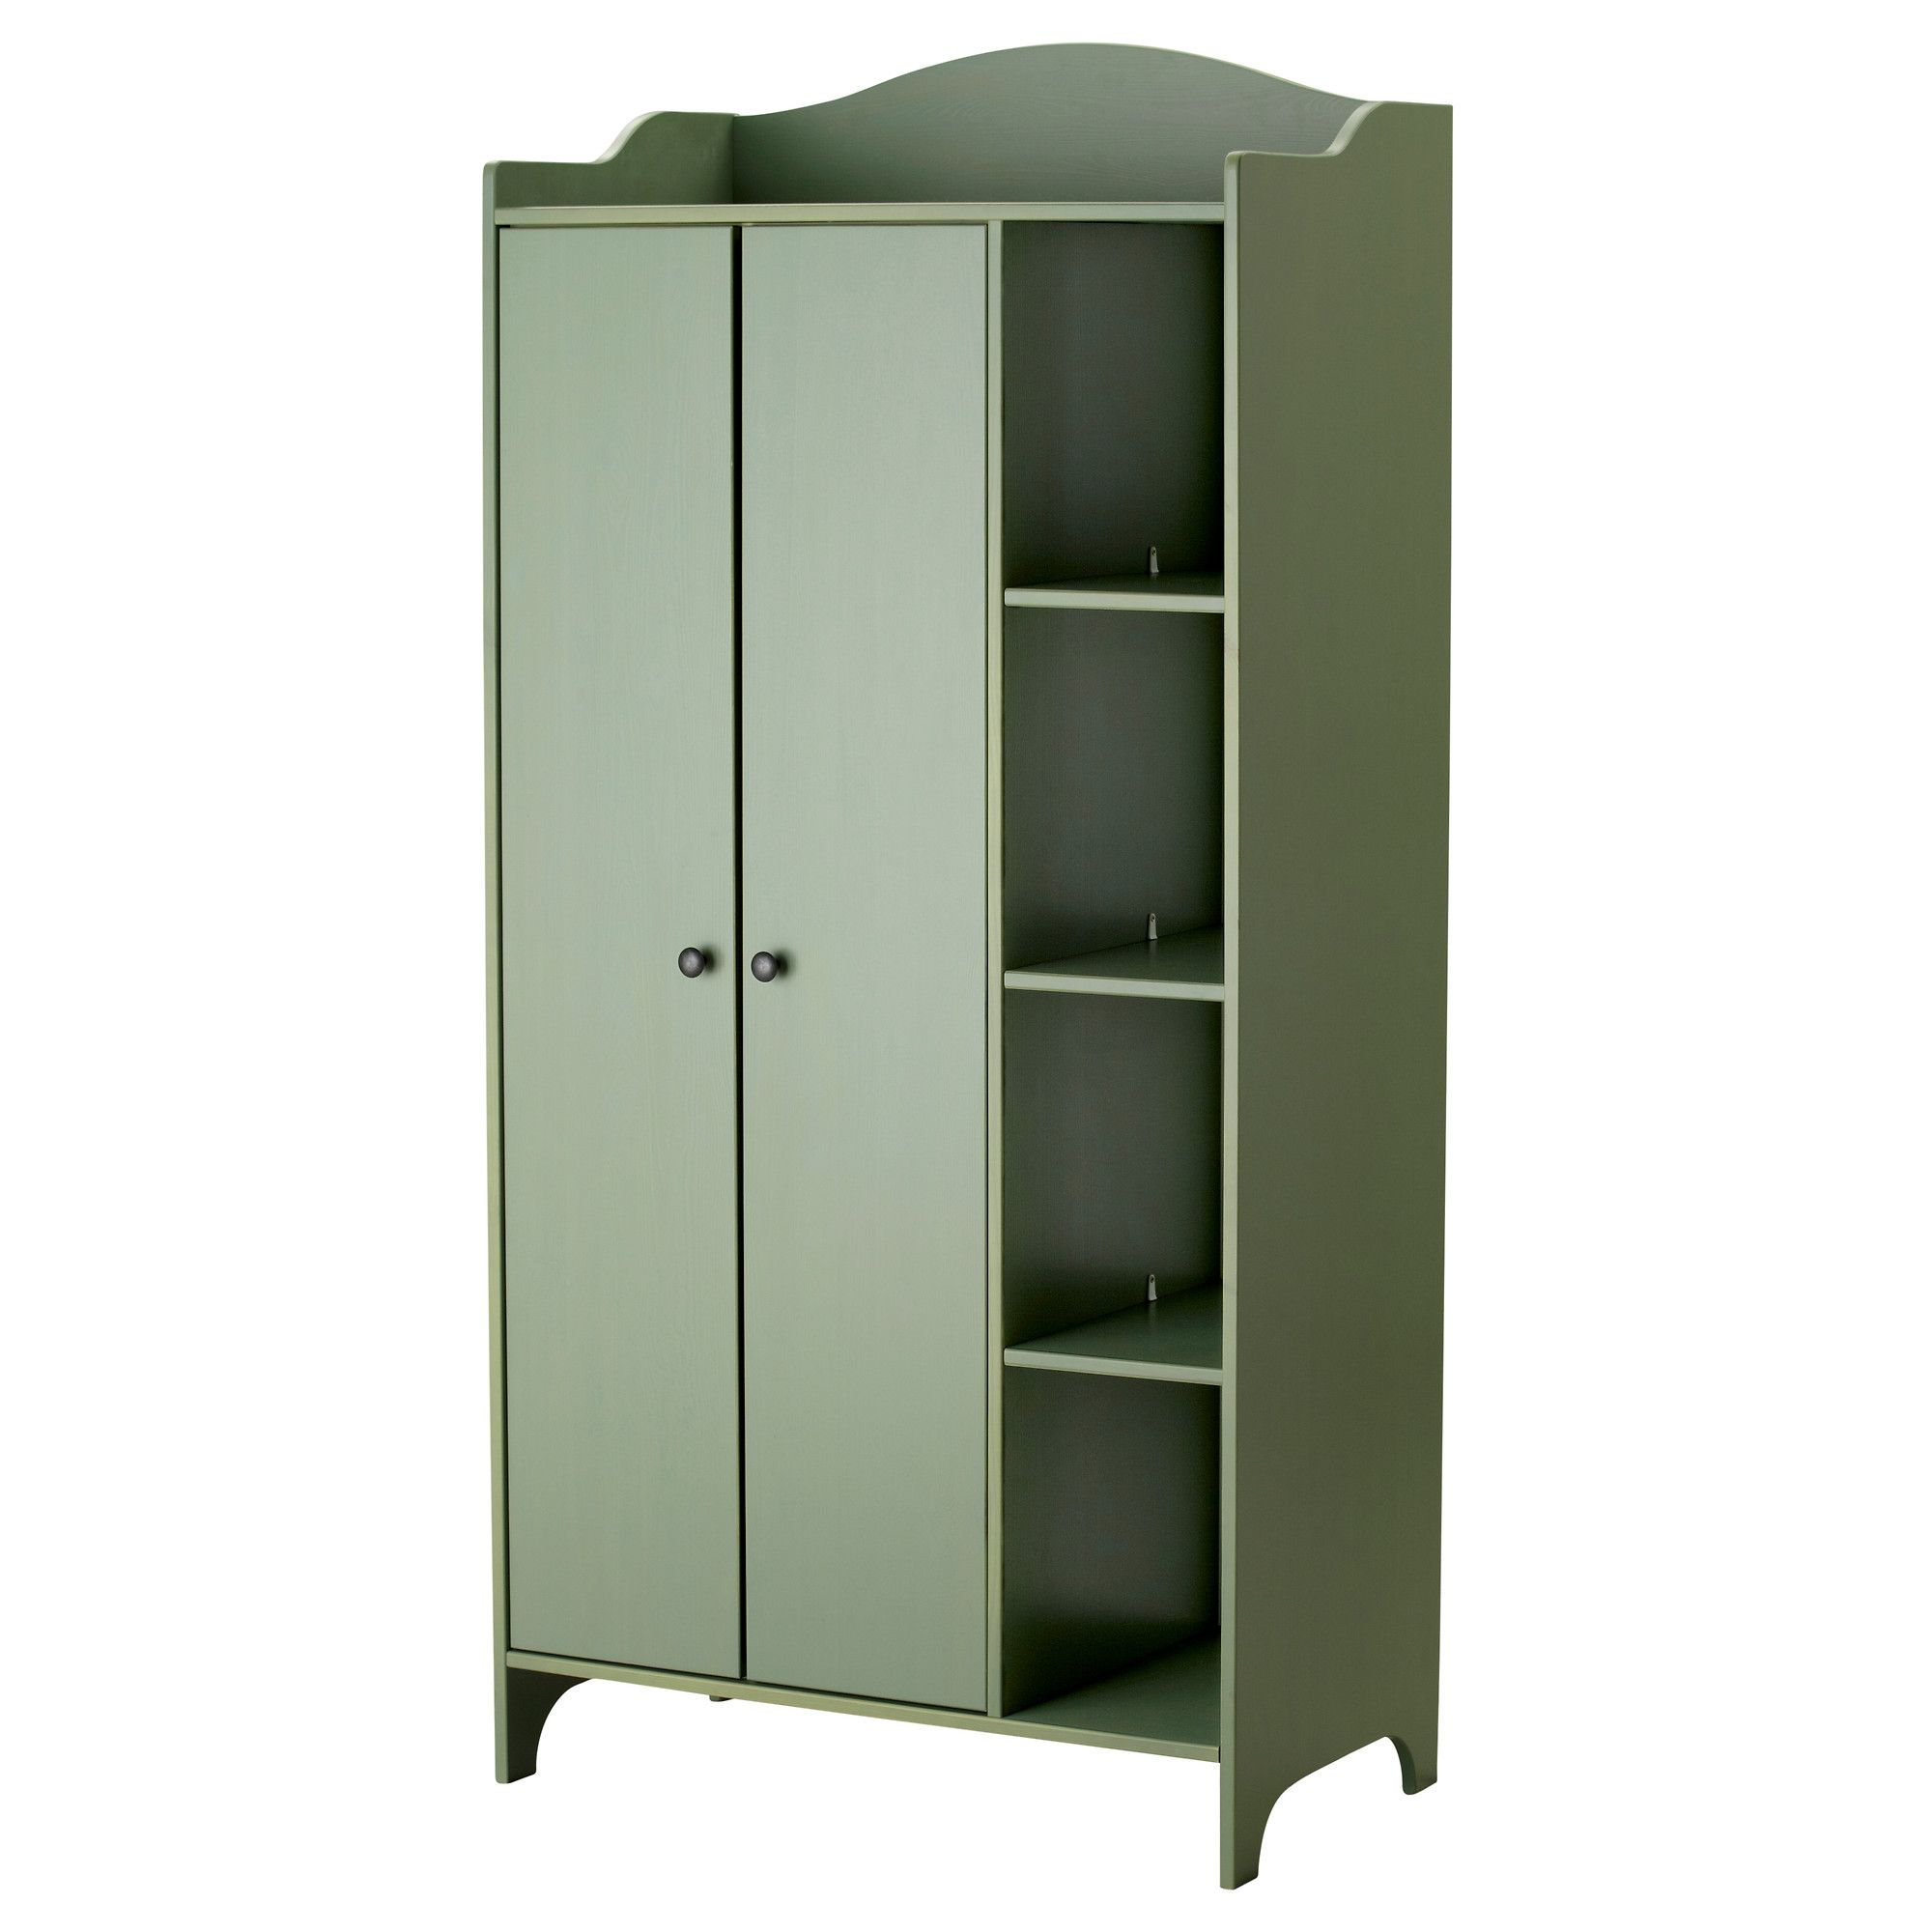 FurnitureLightingHome Accessoriesamp; Shop For MoreBaby Fever v8nN0wOym